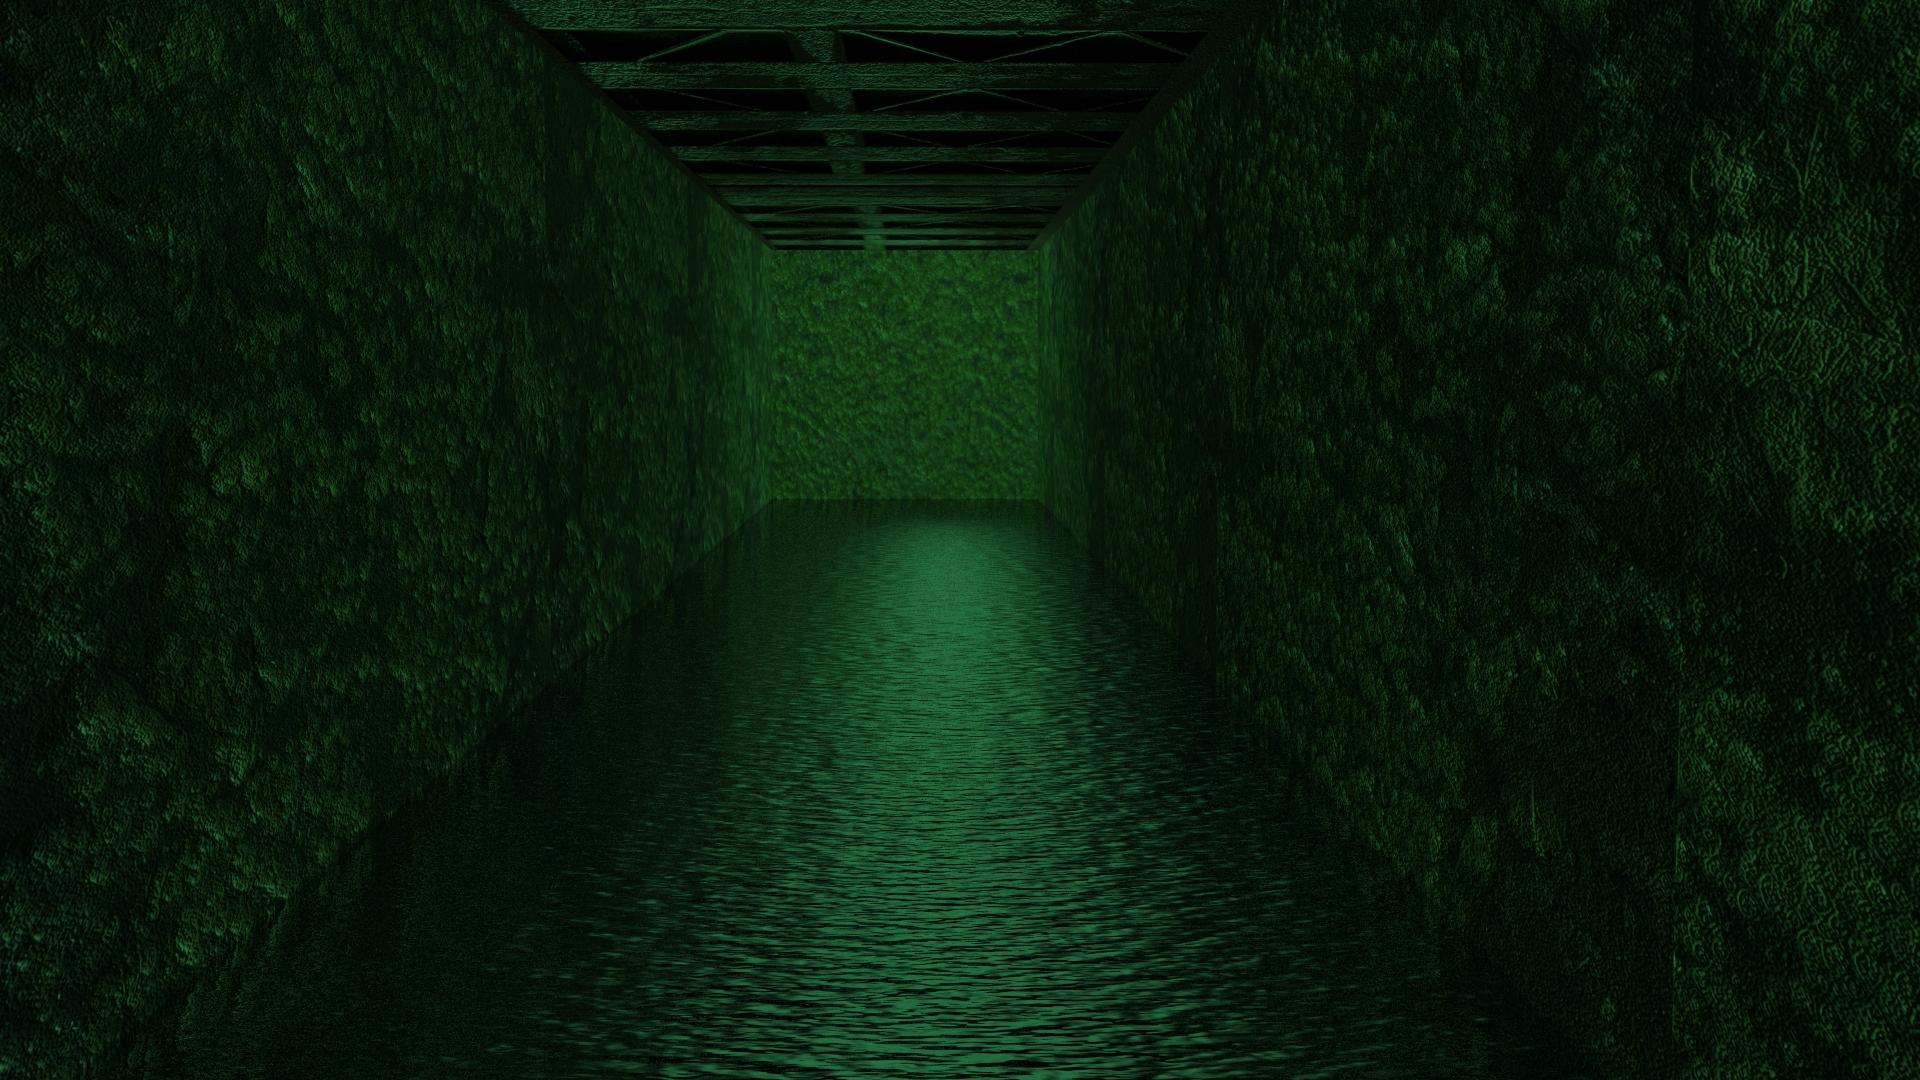 Creepy tunnel of slime